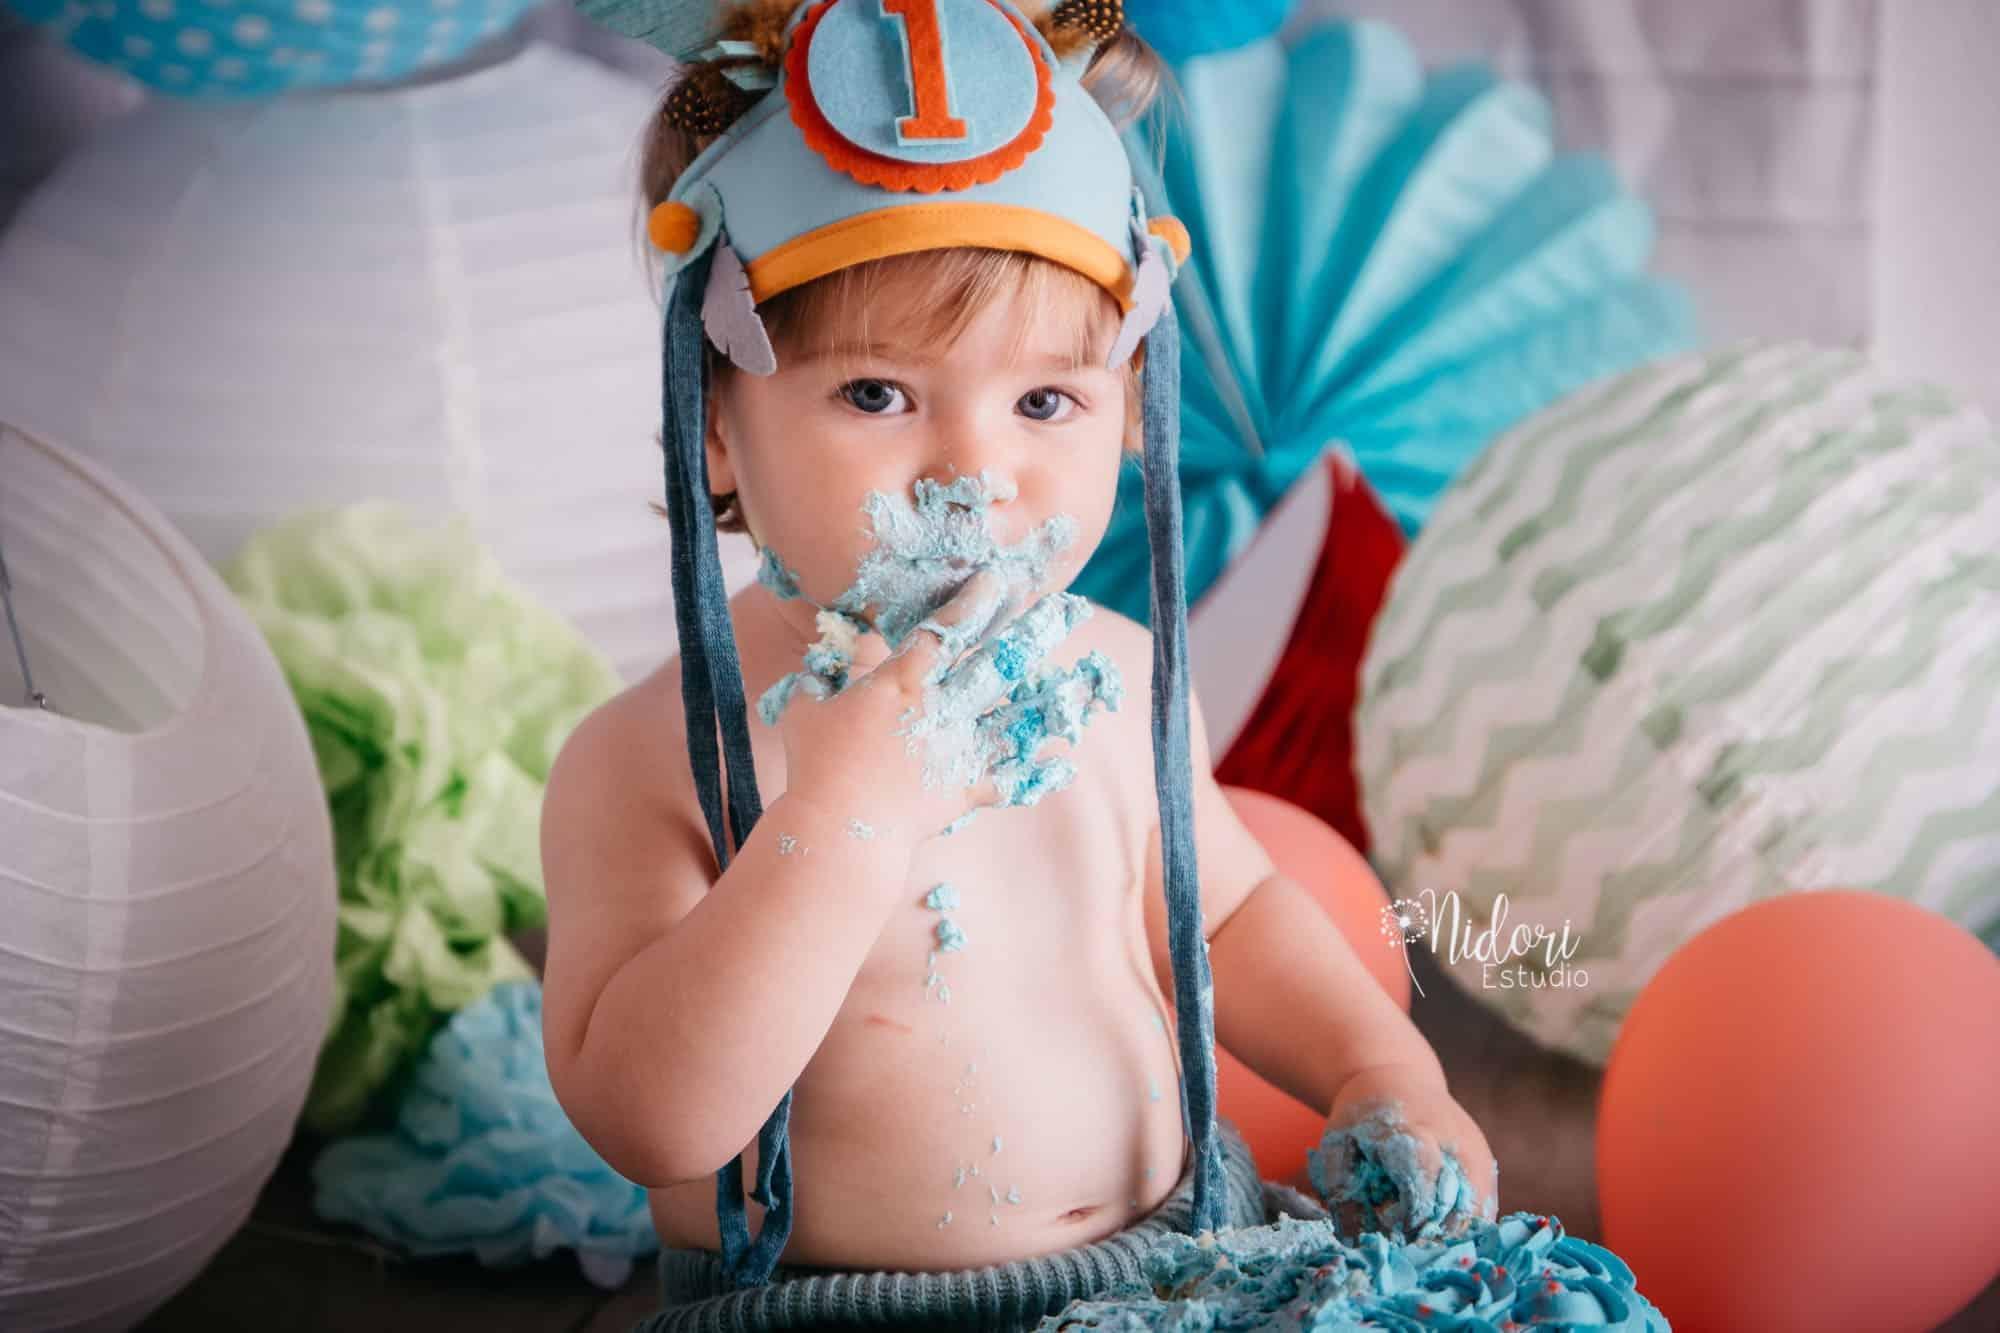 smash-cake-cumpleaños-tarta-fotografia-niños-bebes-nidoriestudio-fotos-valencia-almazora-castellon-españa-spain-21